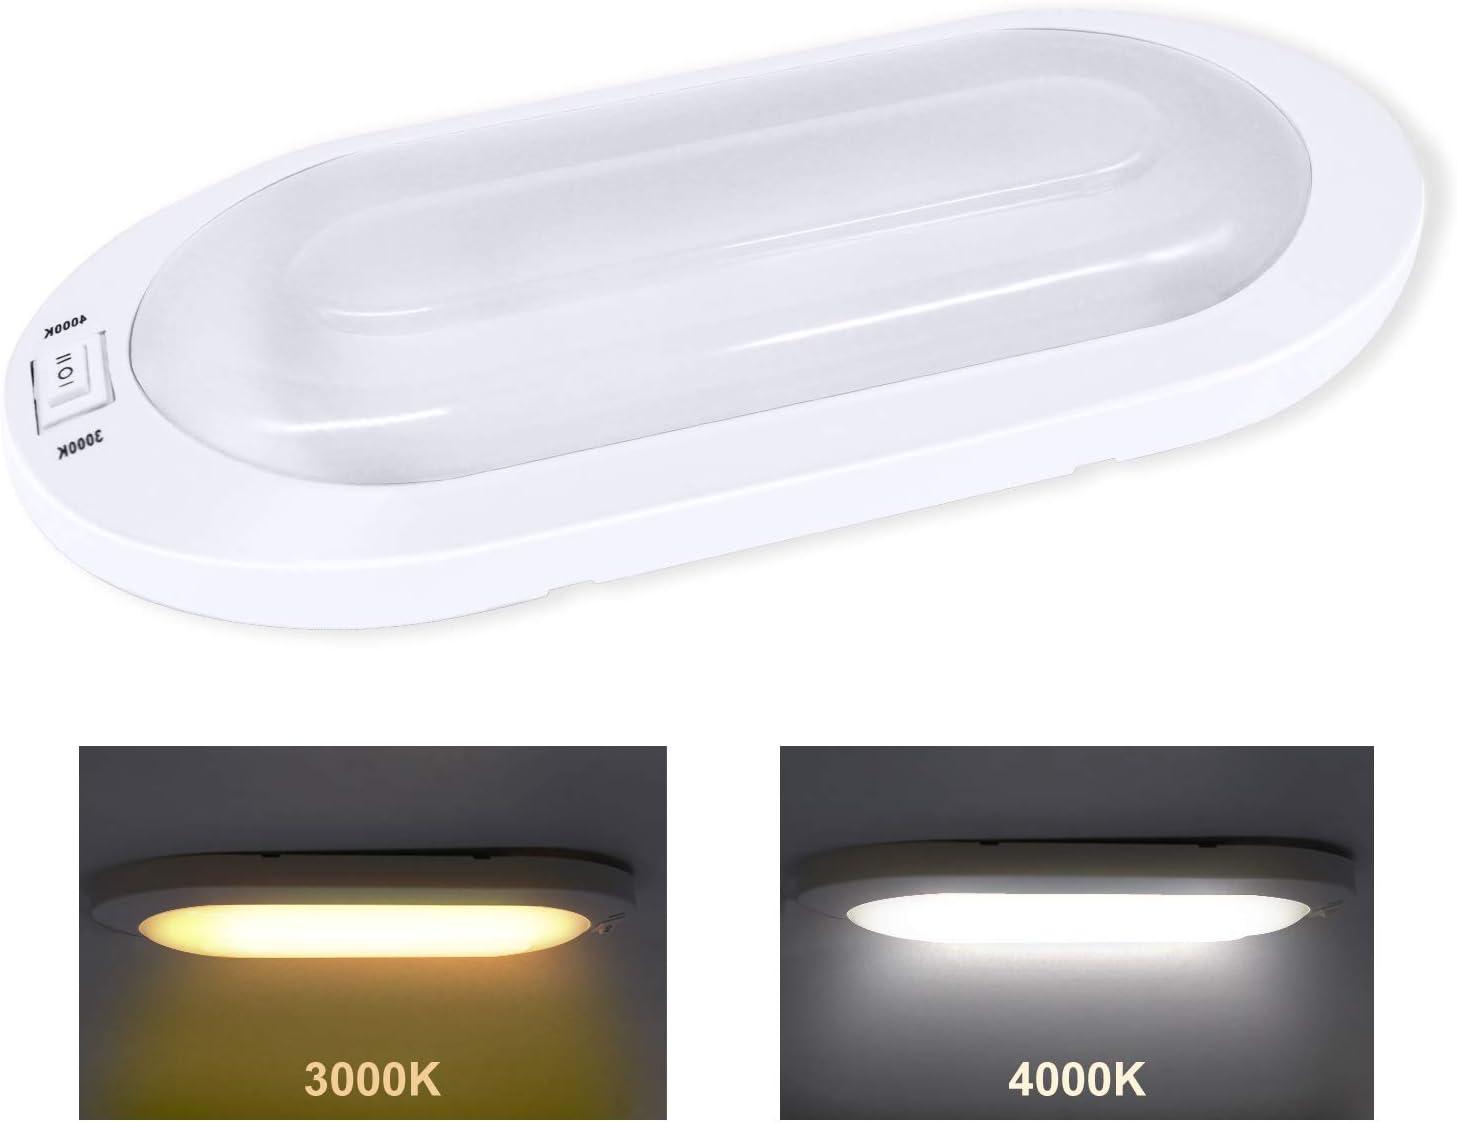 Facon 2pks LED Ceiling Light Interior Light with On//Off Switch 12V 4000K for Campervan Trailer Marine and Vehicle Motorhome Caravan Boat